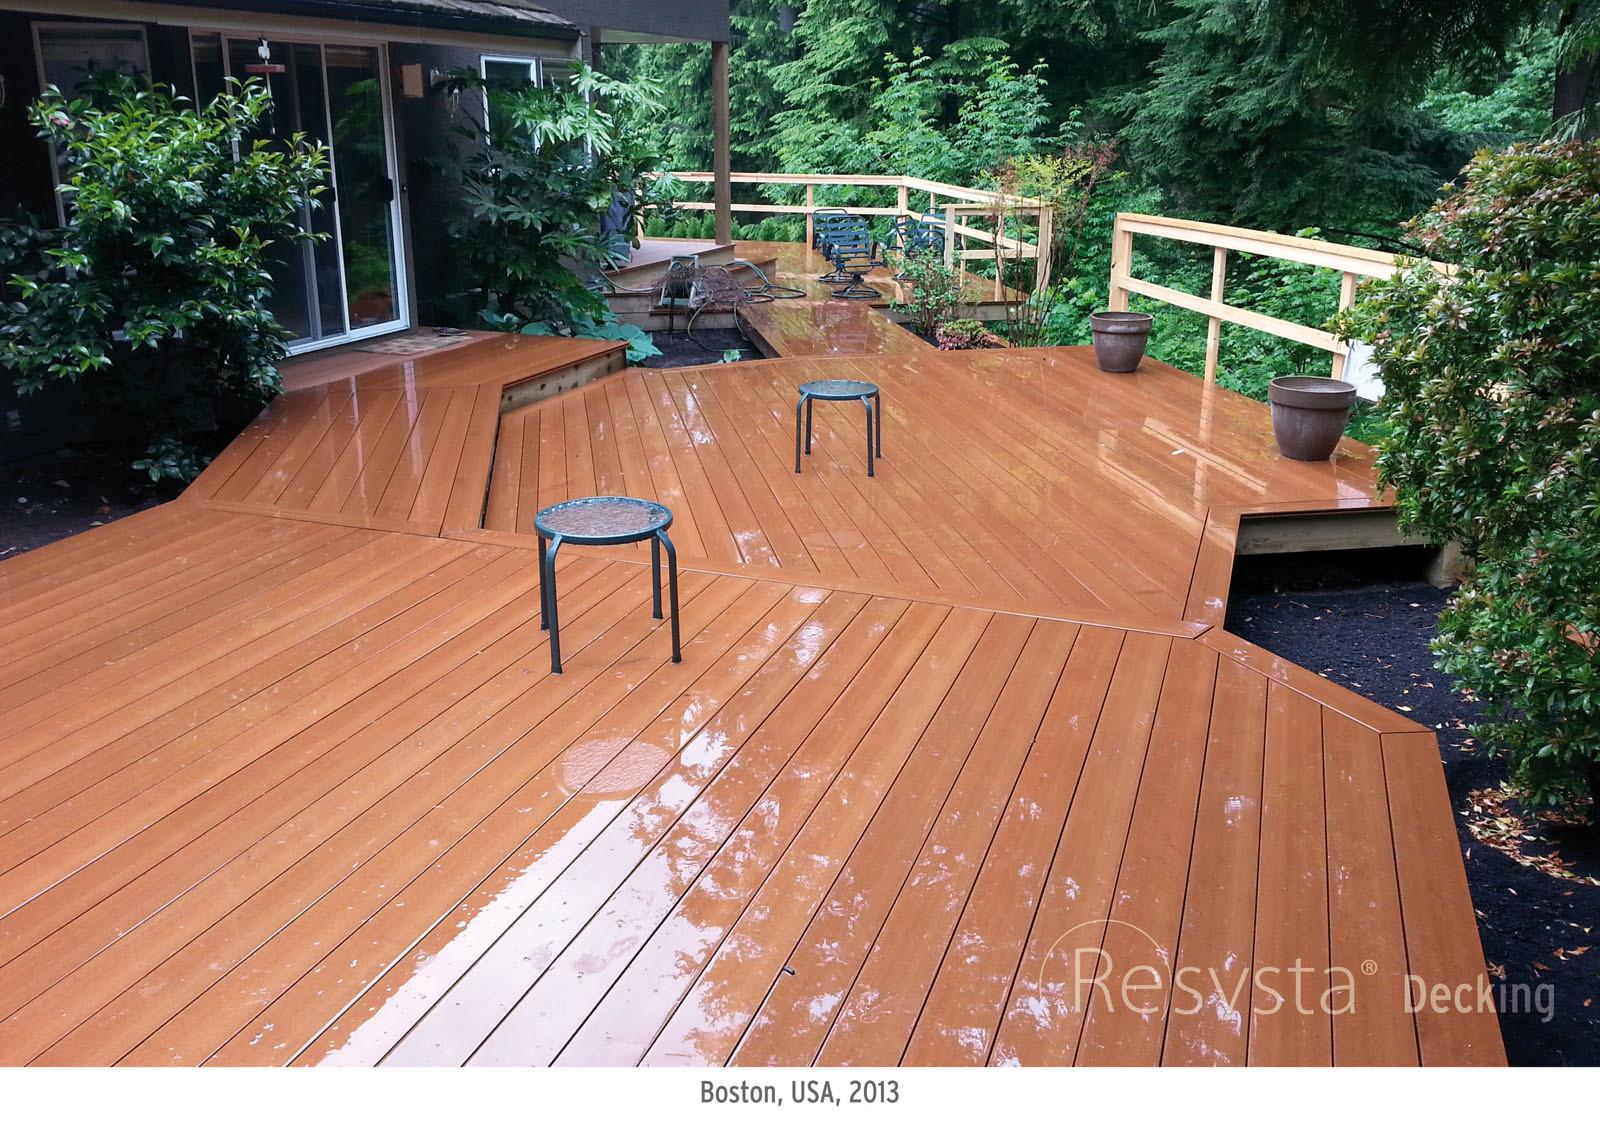 Pacific American Lumber